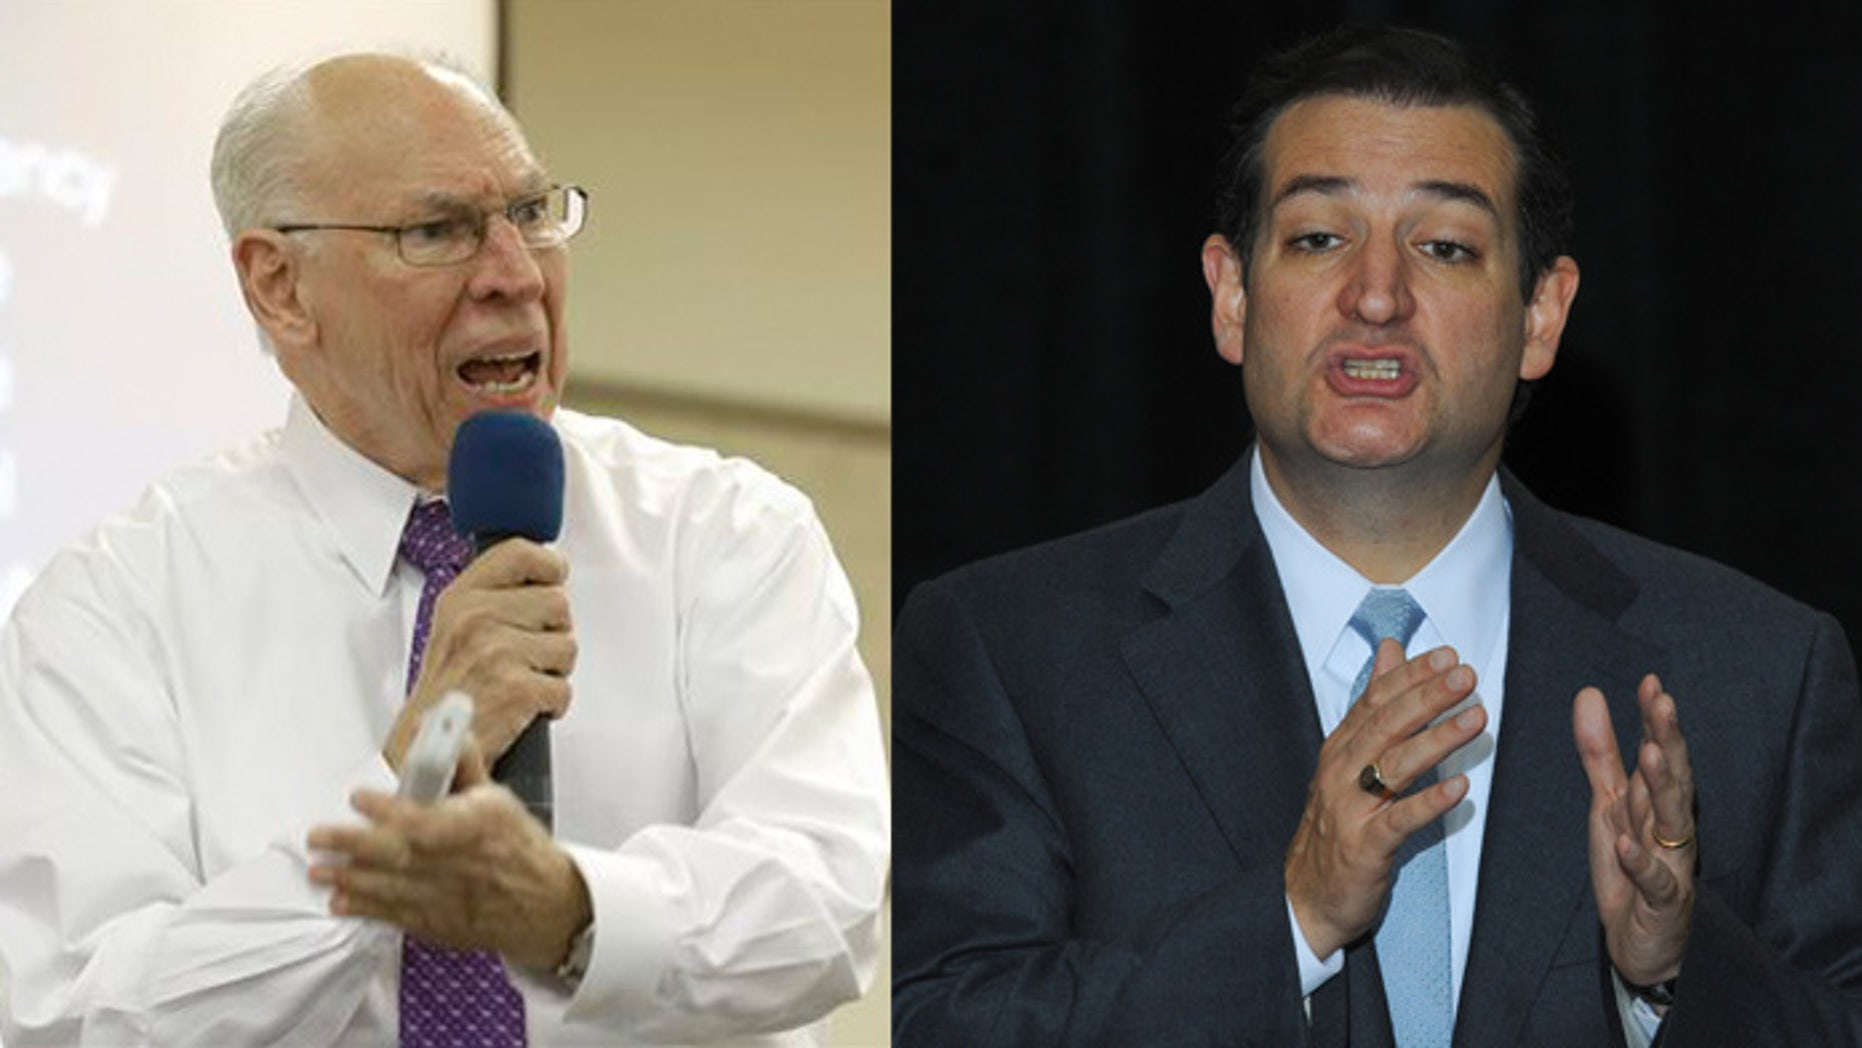 Rafael Cruz and son Sen. Ted Cruz.